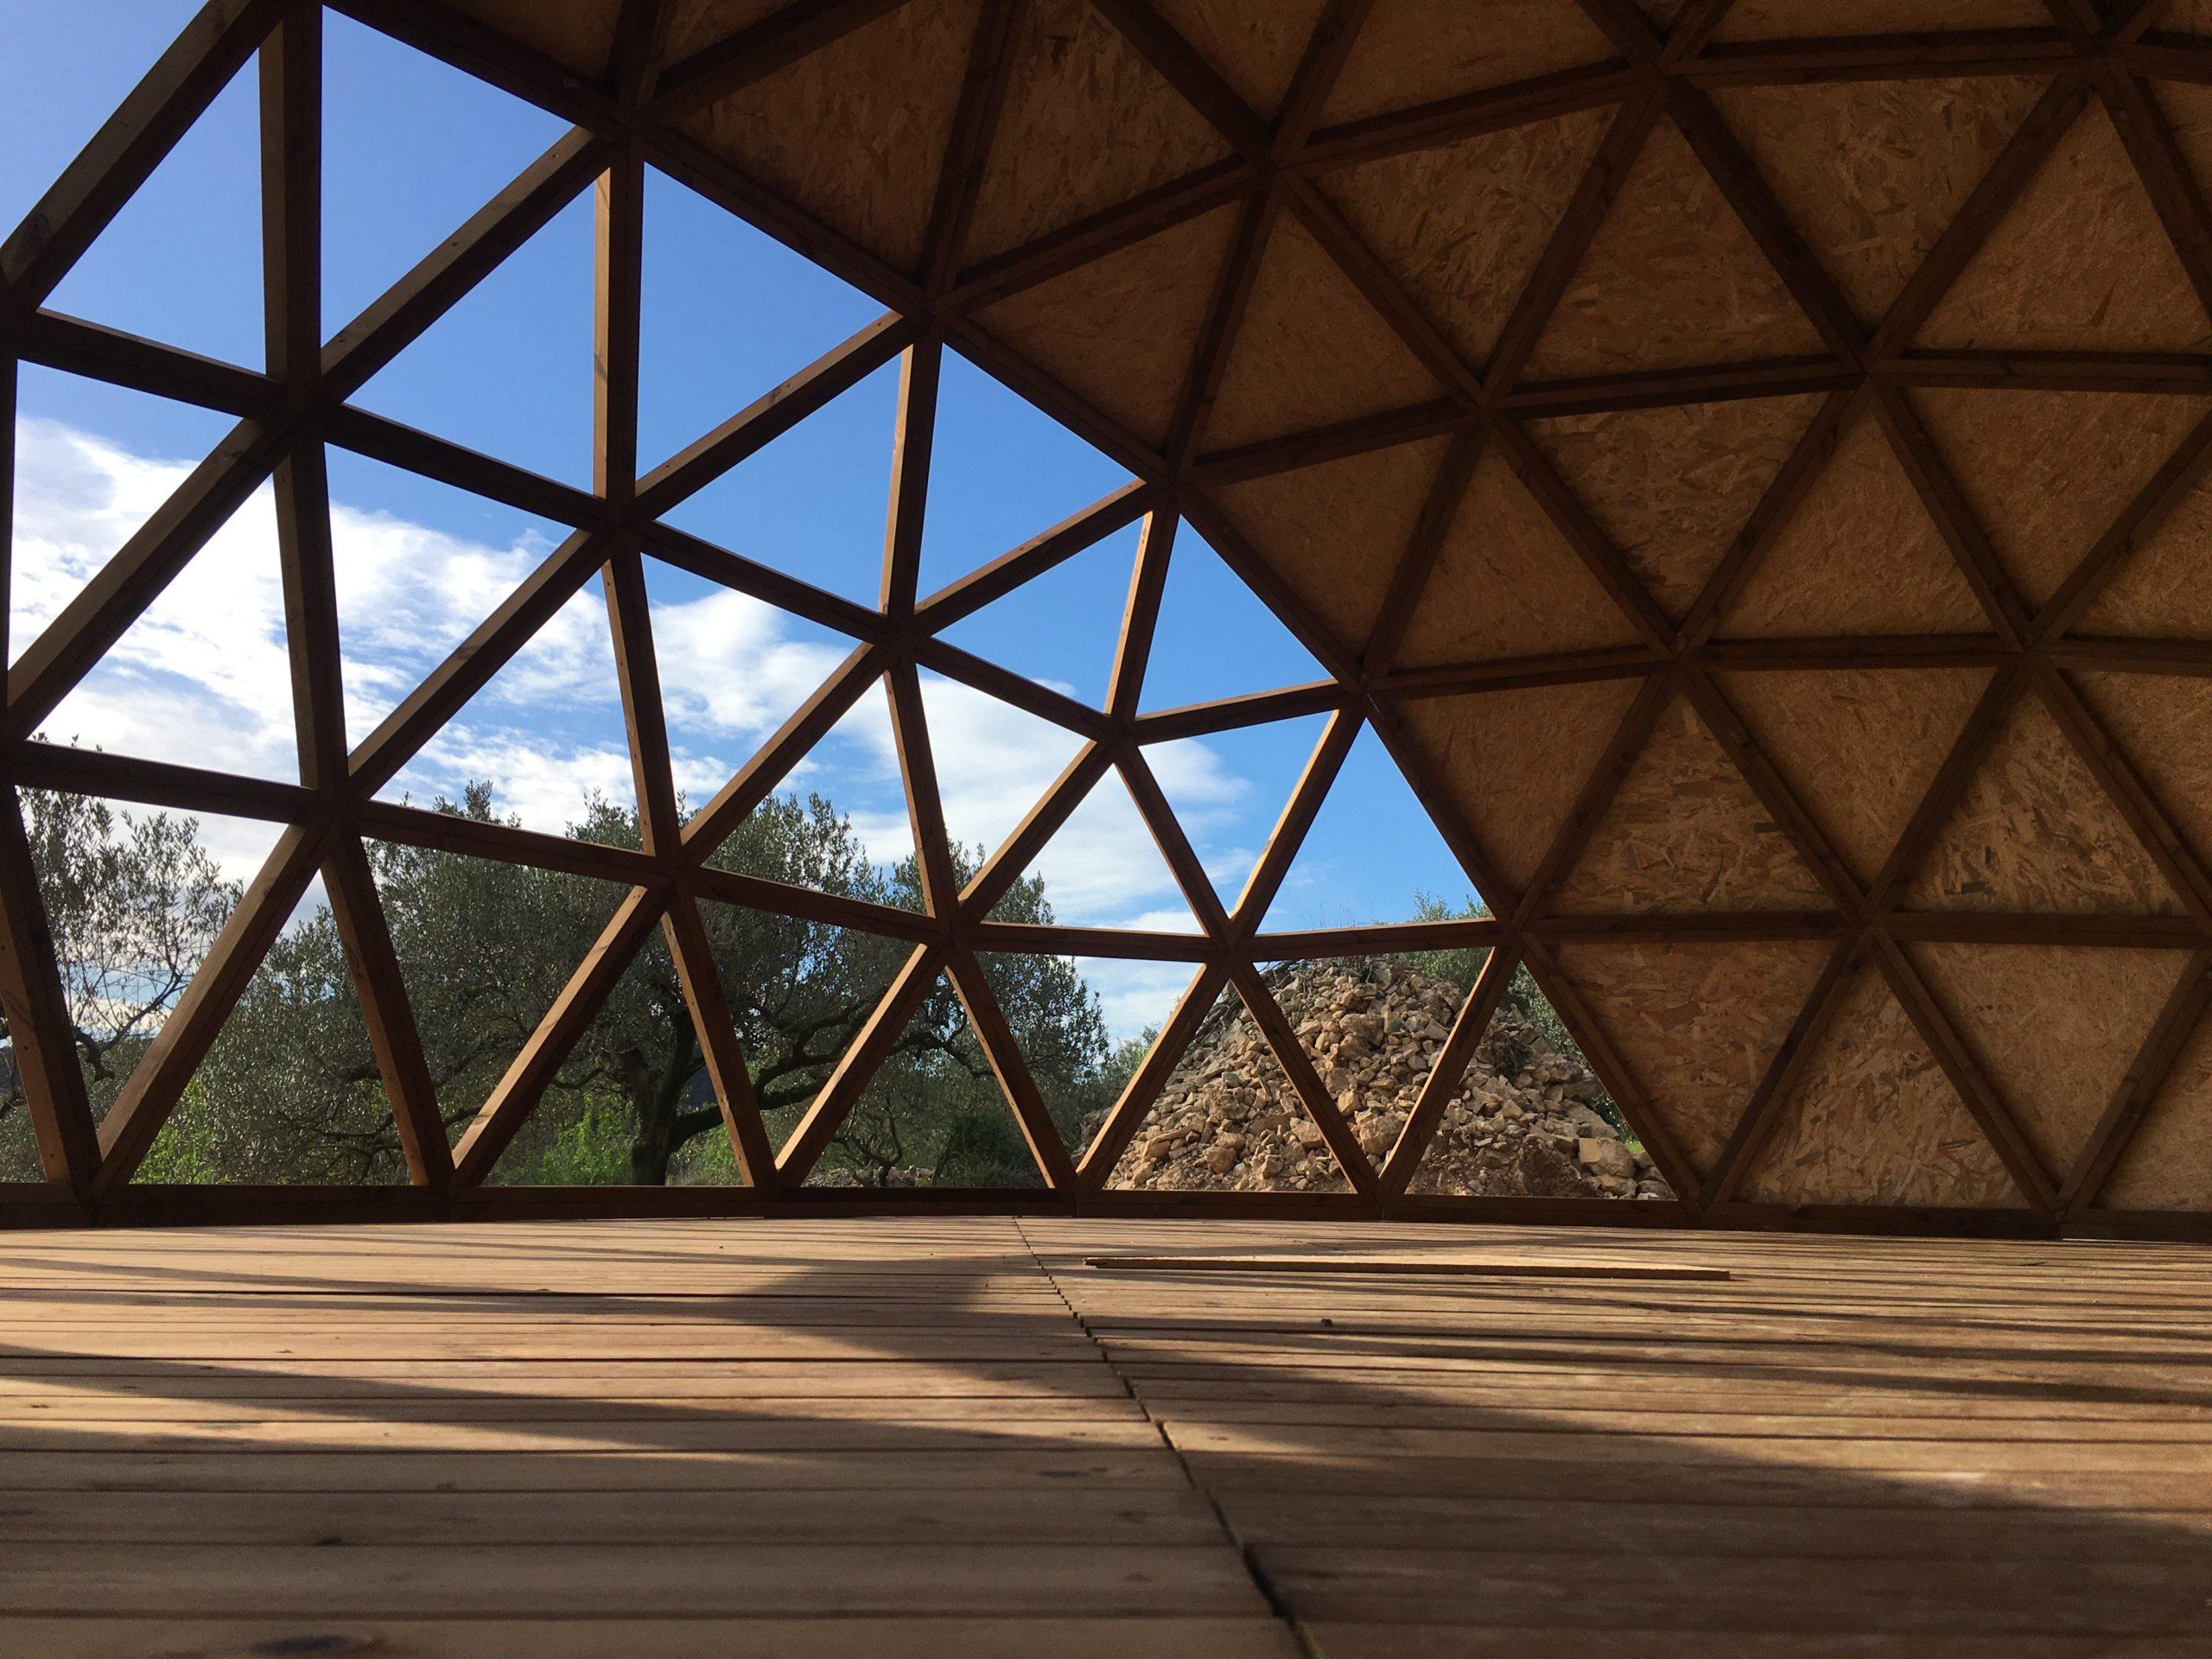 House Dome en Begur